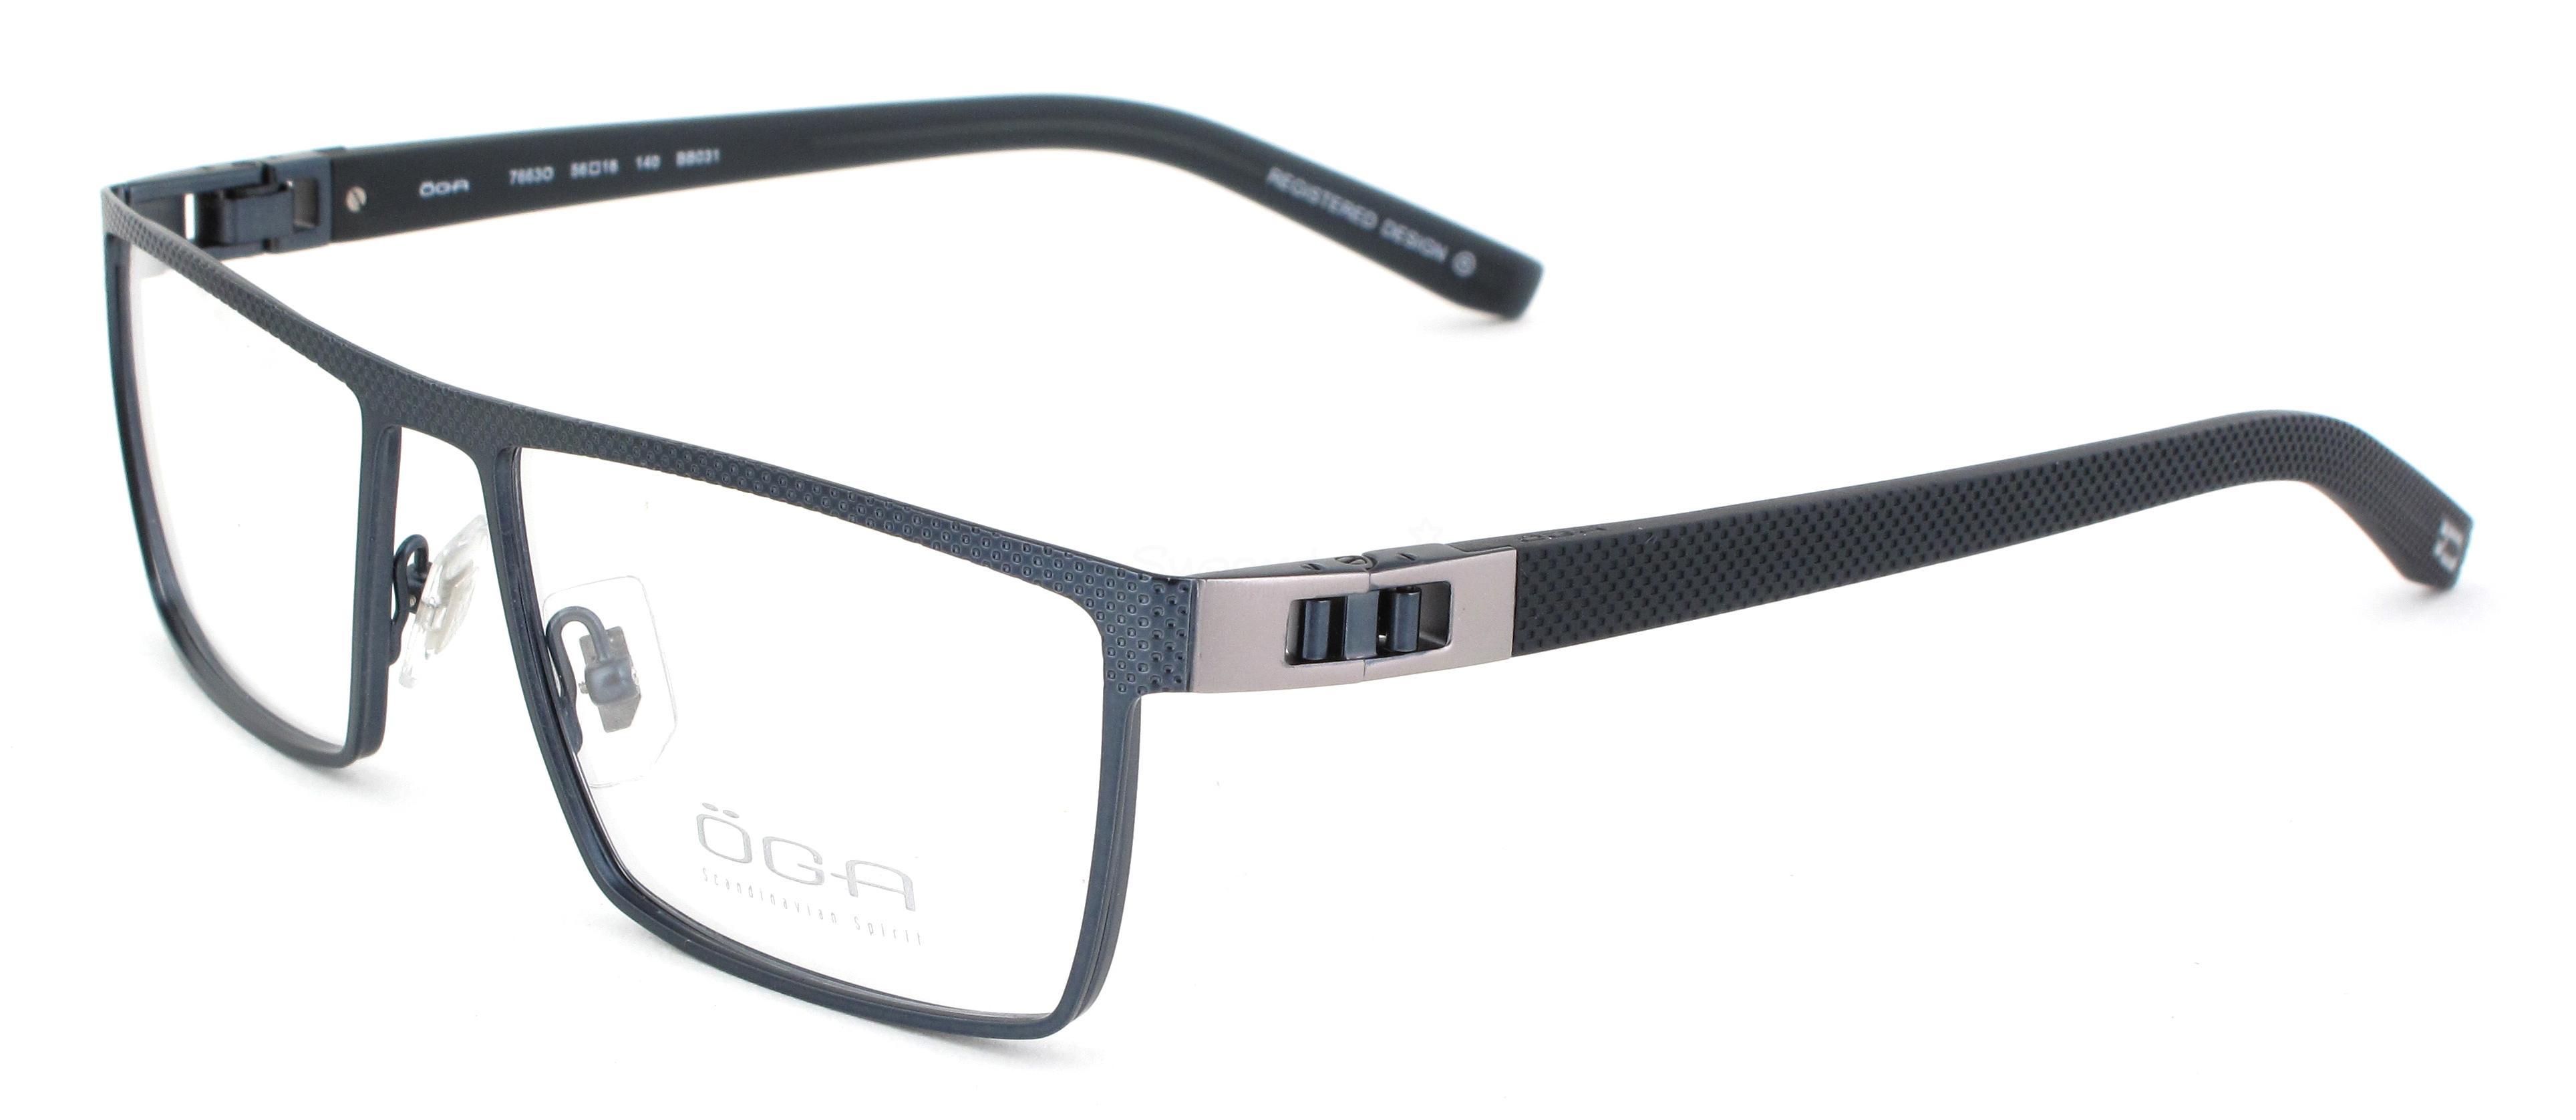 BB031 7663O COPENTOLE Glasses, ÖGA Scandinavian Spirit